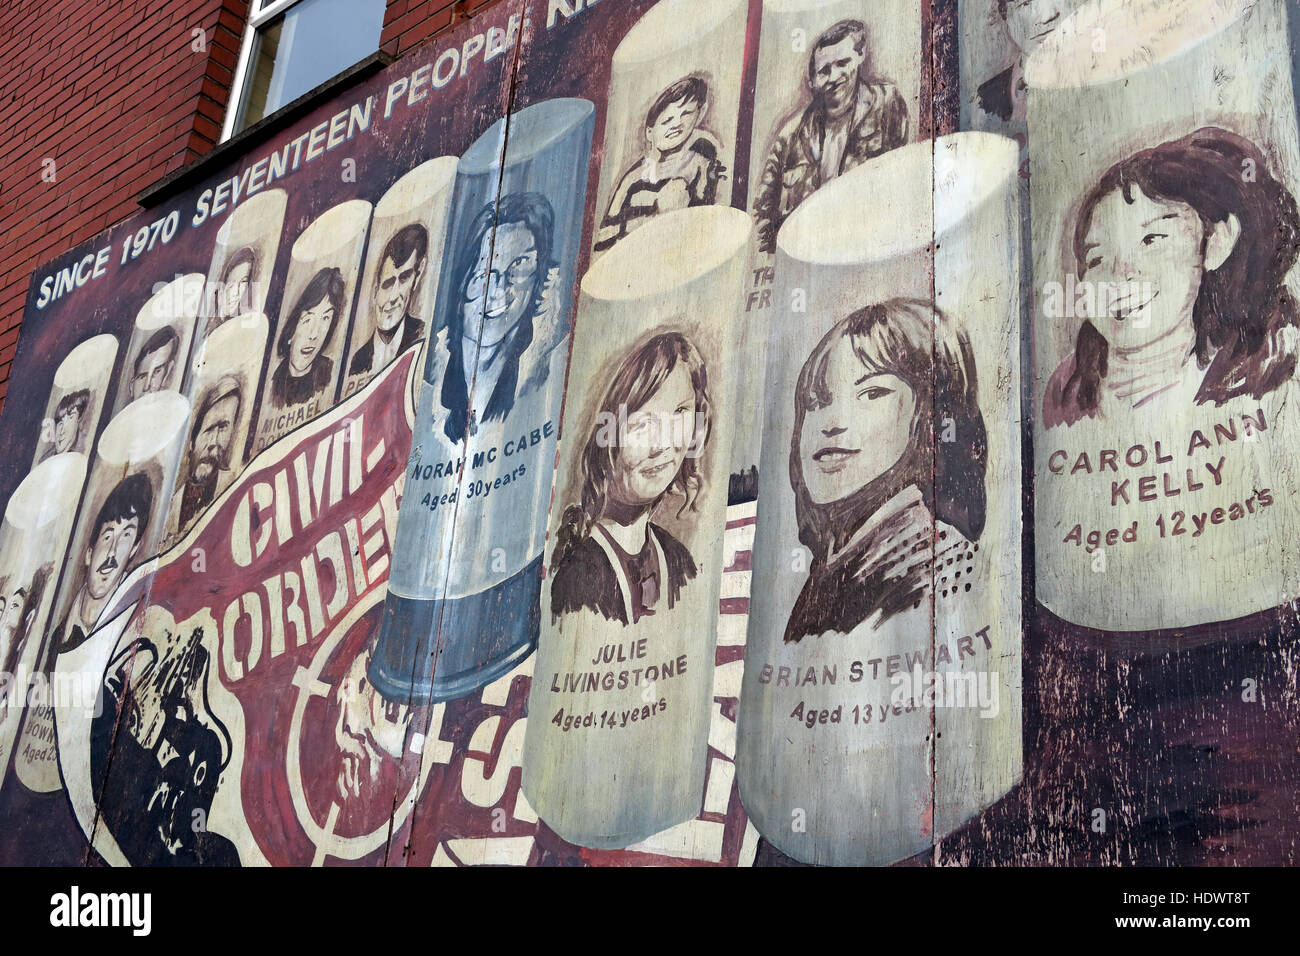 Belfast Falls Rd Republican Mural - Seventeen People Dead - Stock Image